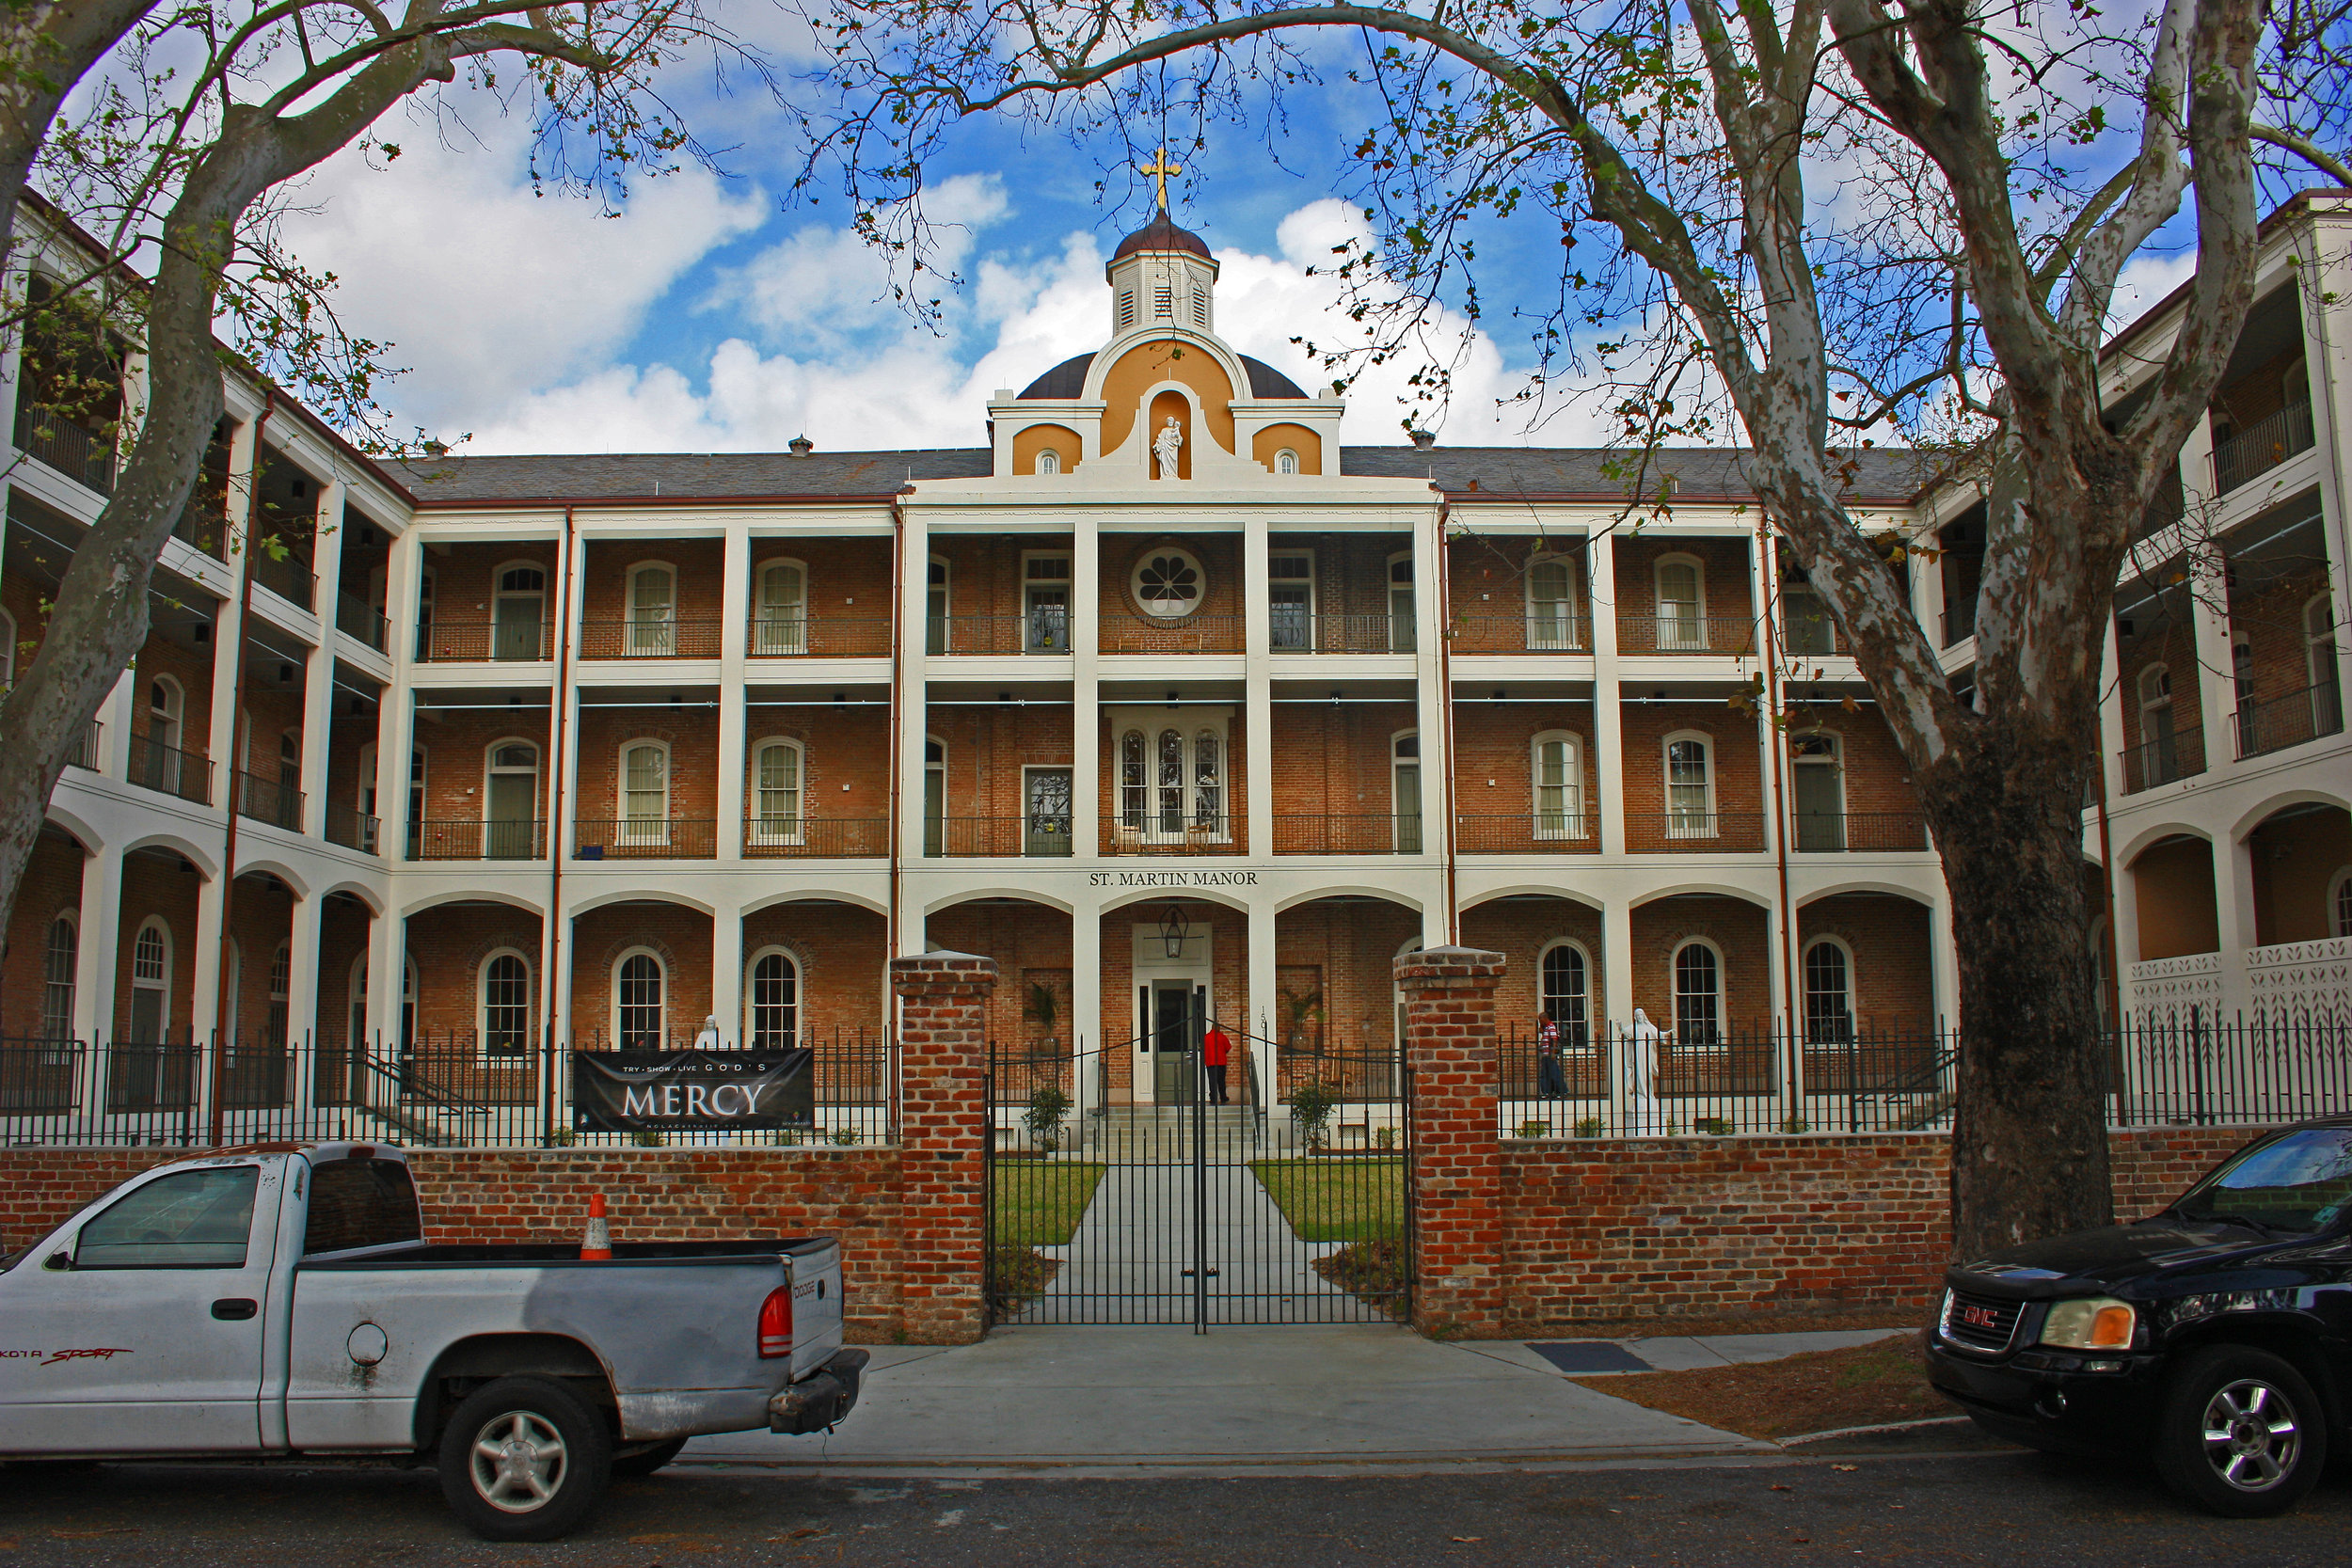 St. Martin Manor